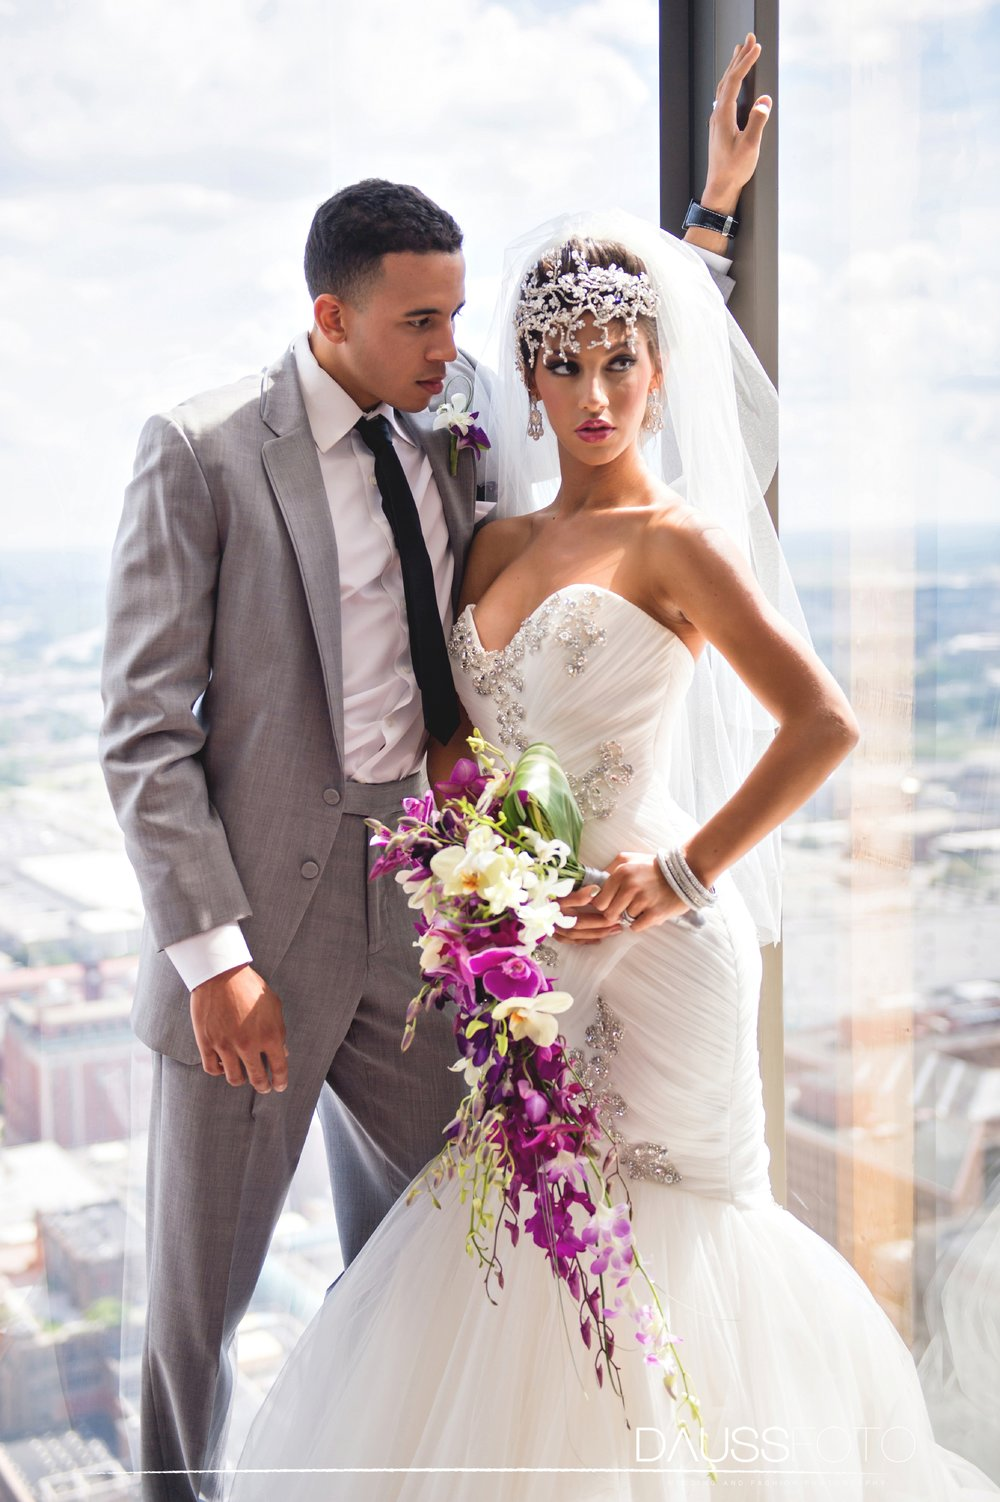 DaussFOTO_20150721_051_Indiana Wedding Photographer.jpg